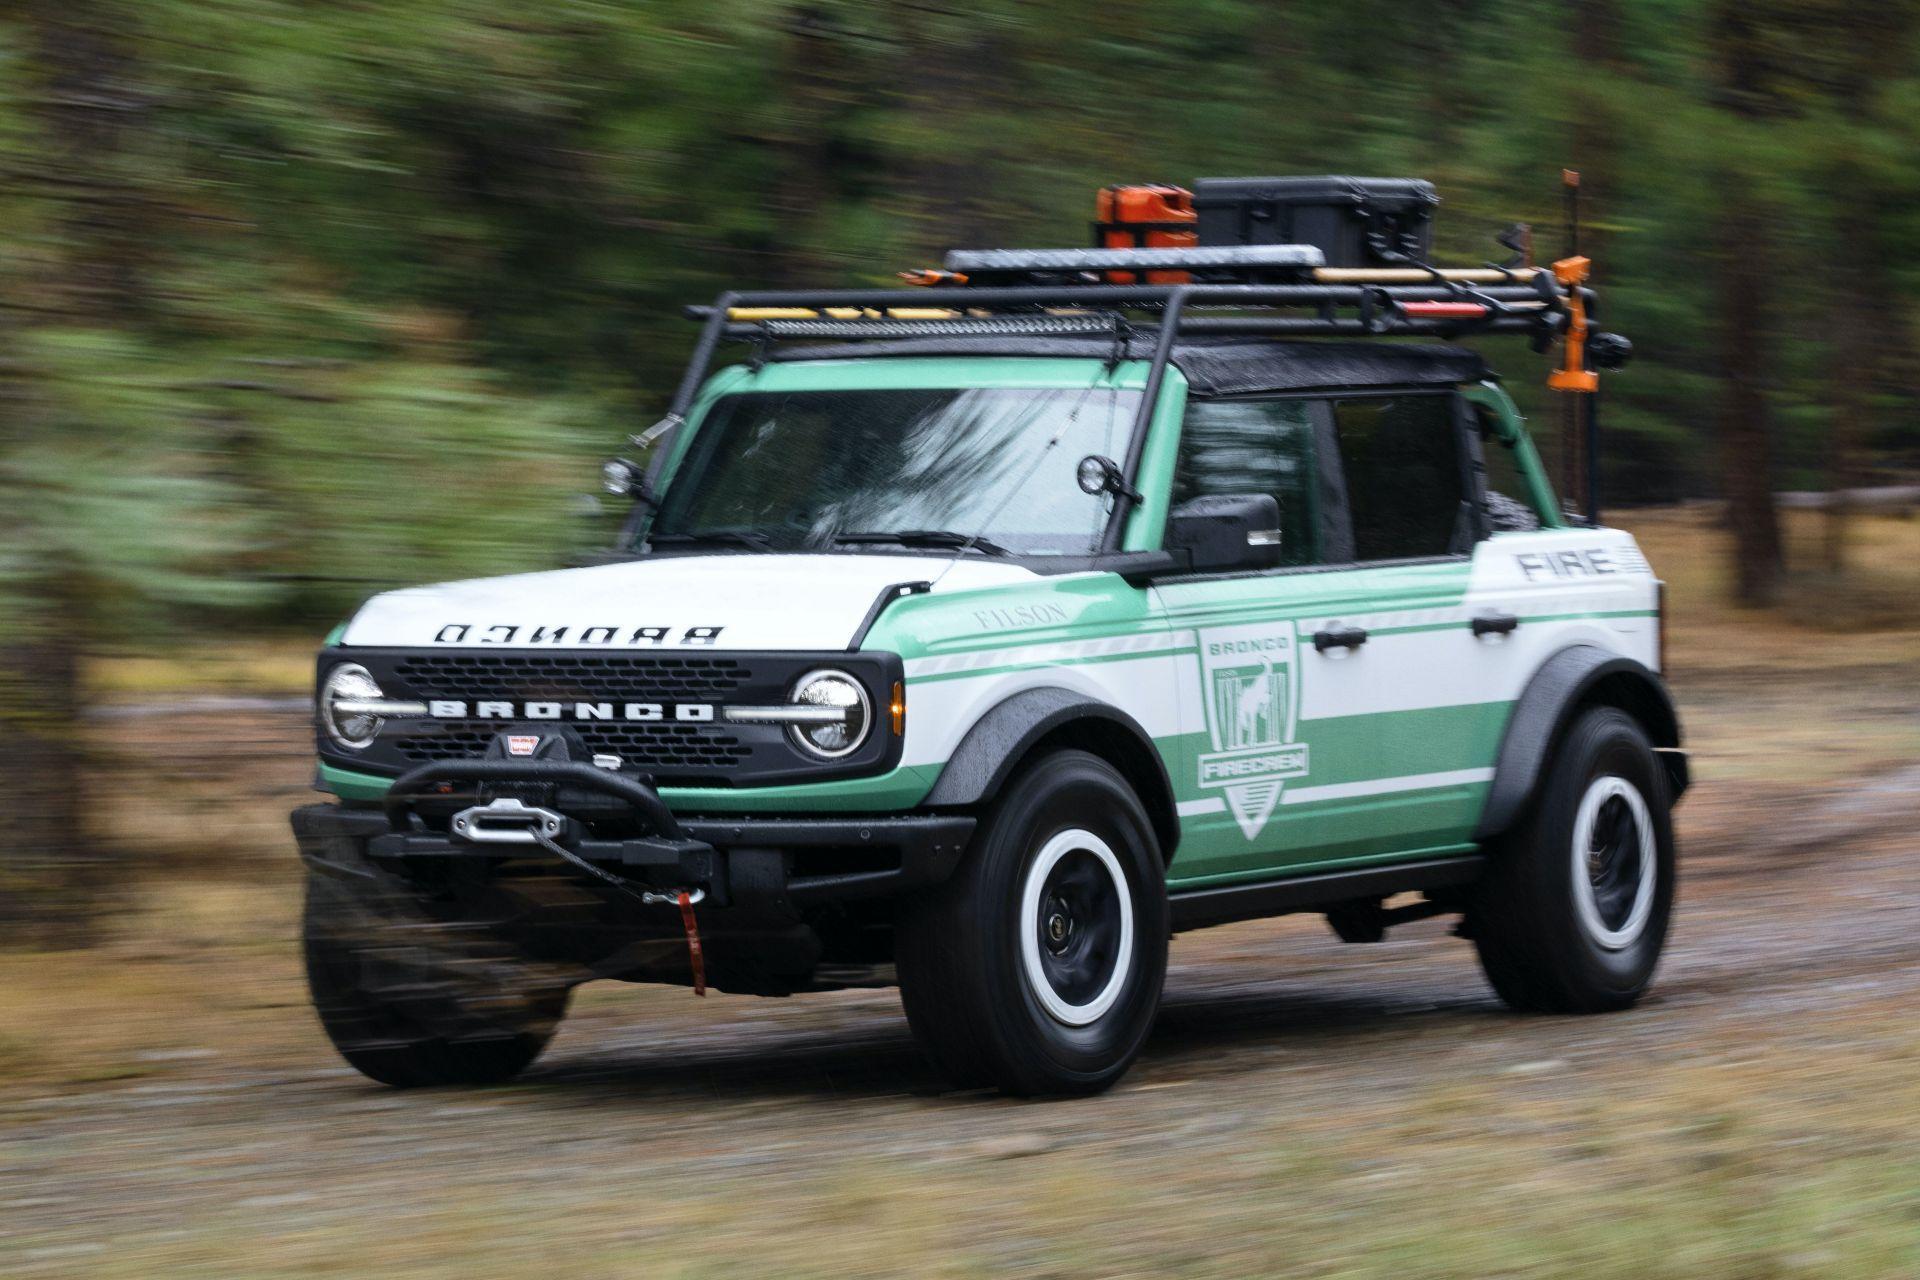 Ford-Bronco-Wildland-Fire-Rig-Concept-5